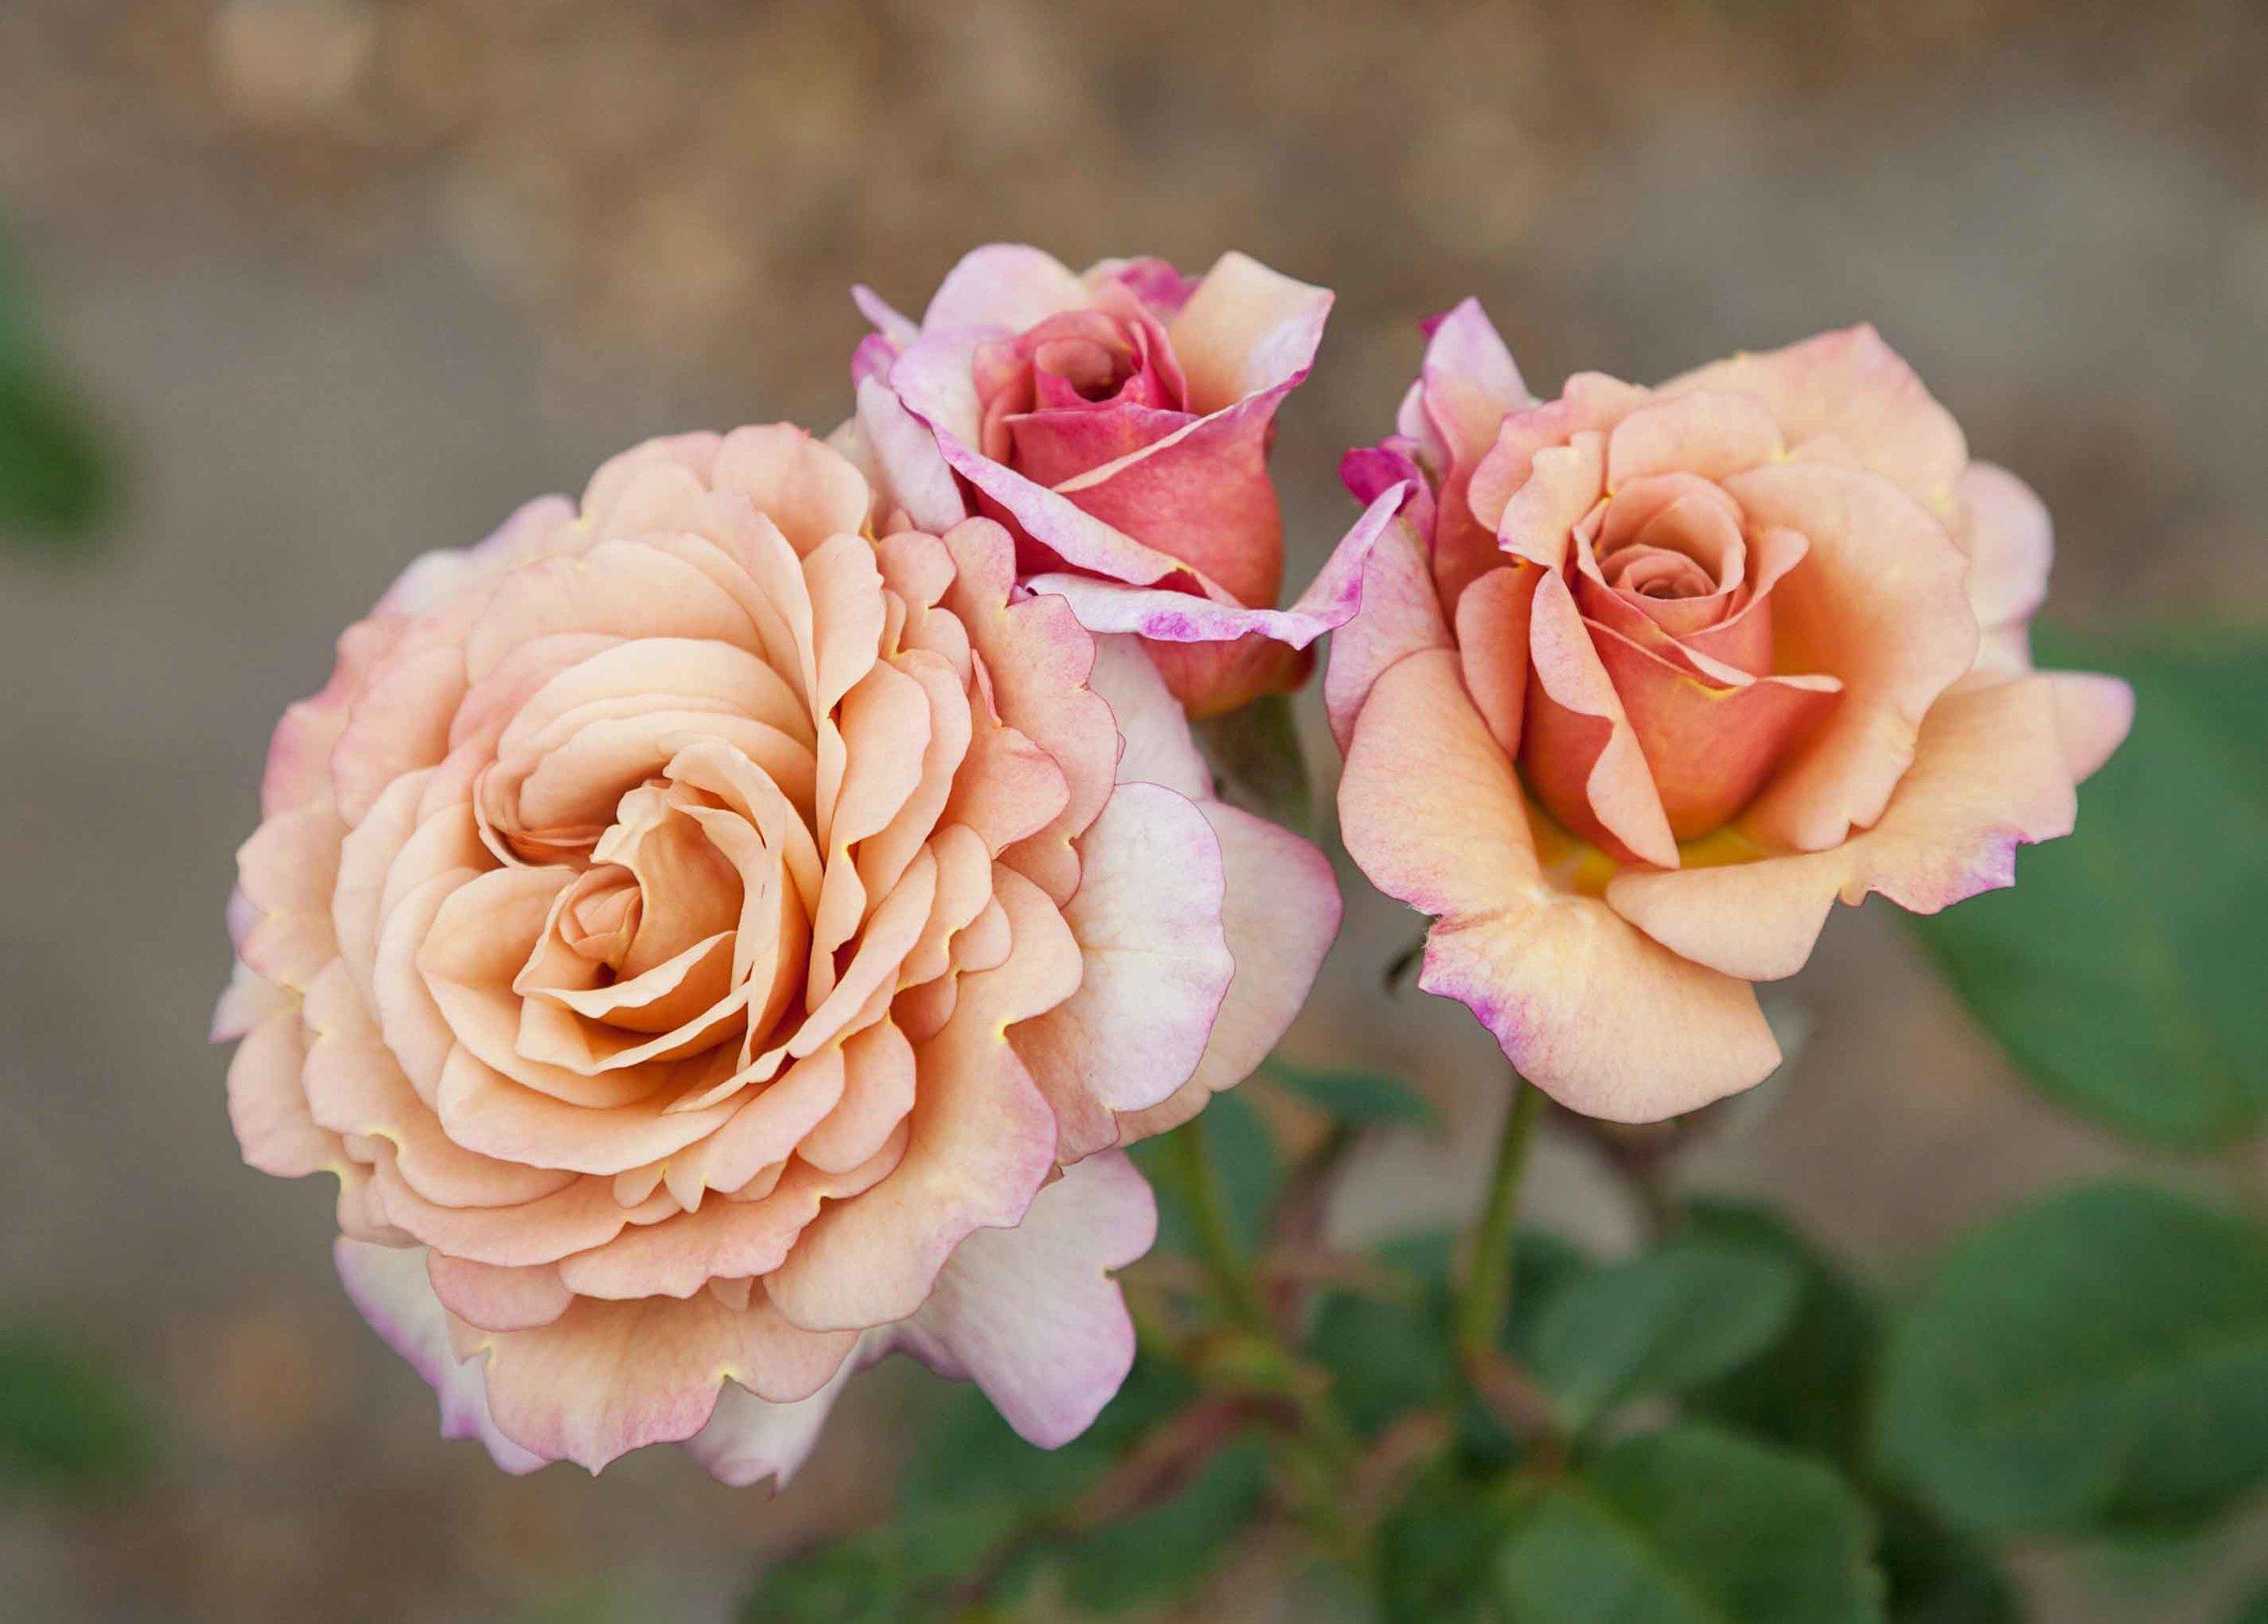 roses-reduced-6.jpg